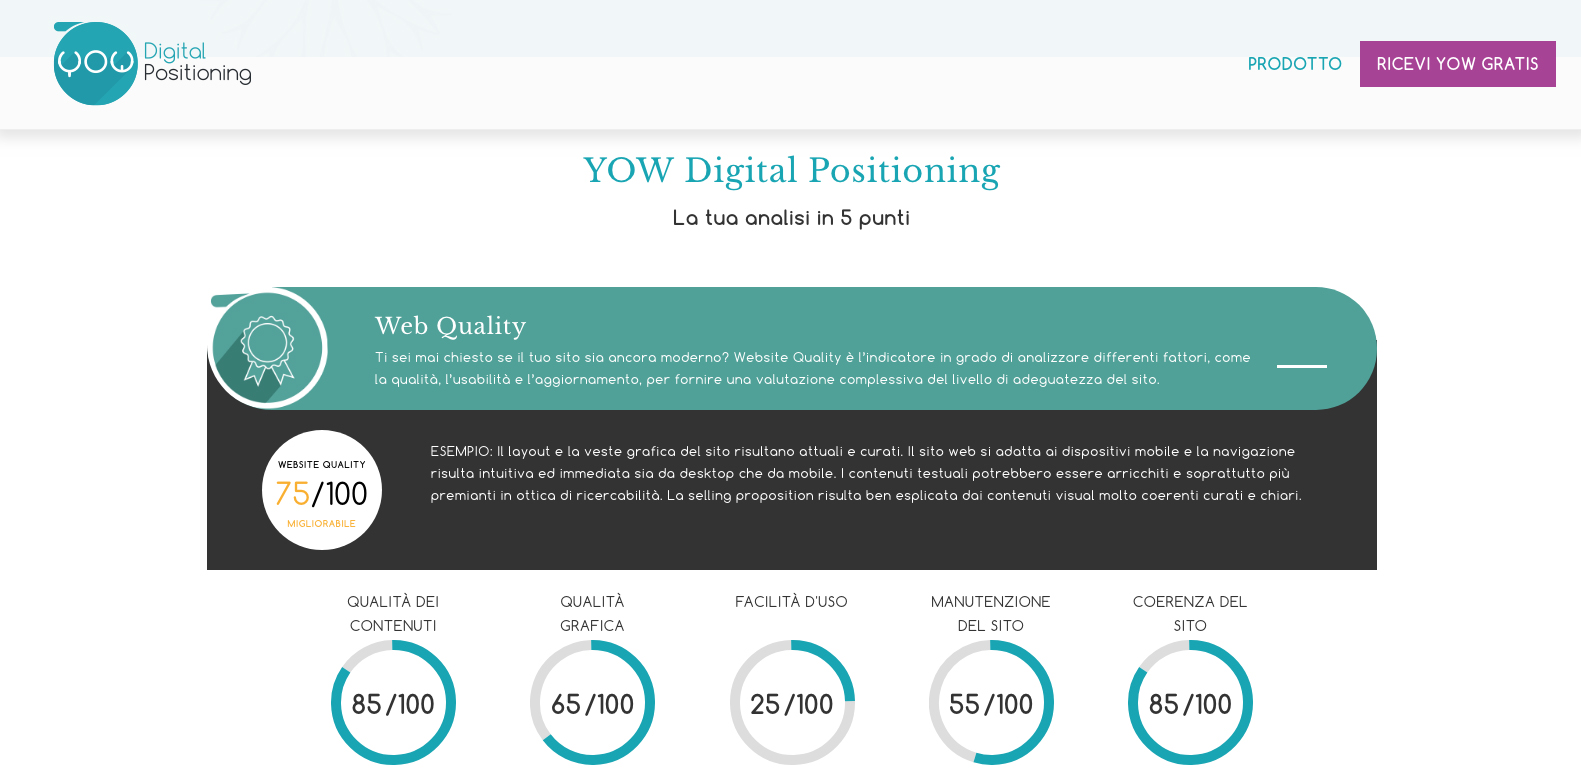 YOW Digital Positioning